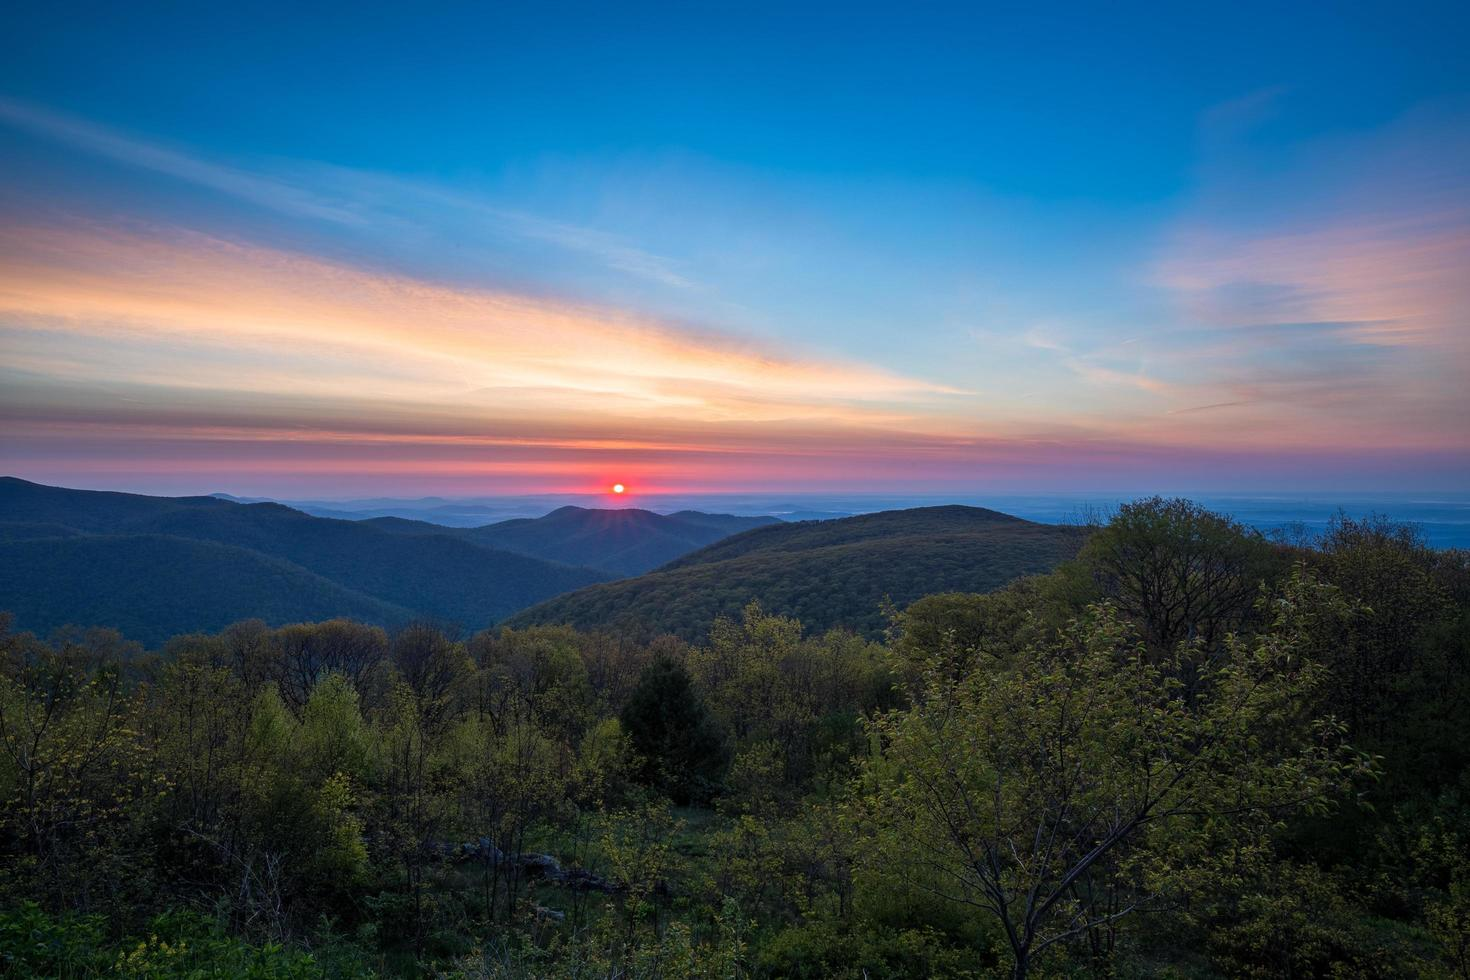 Sonnenaufgang im Shenandoah National Park foto